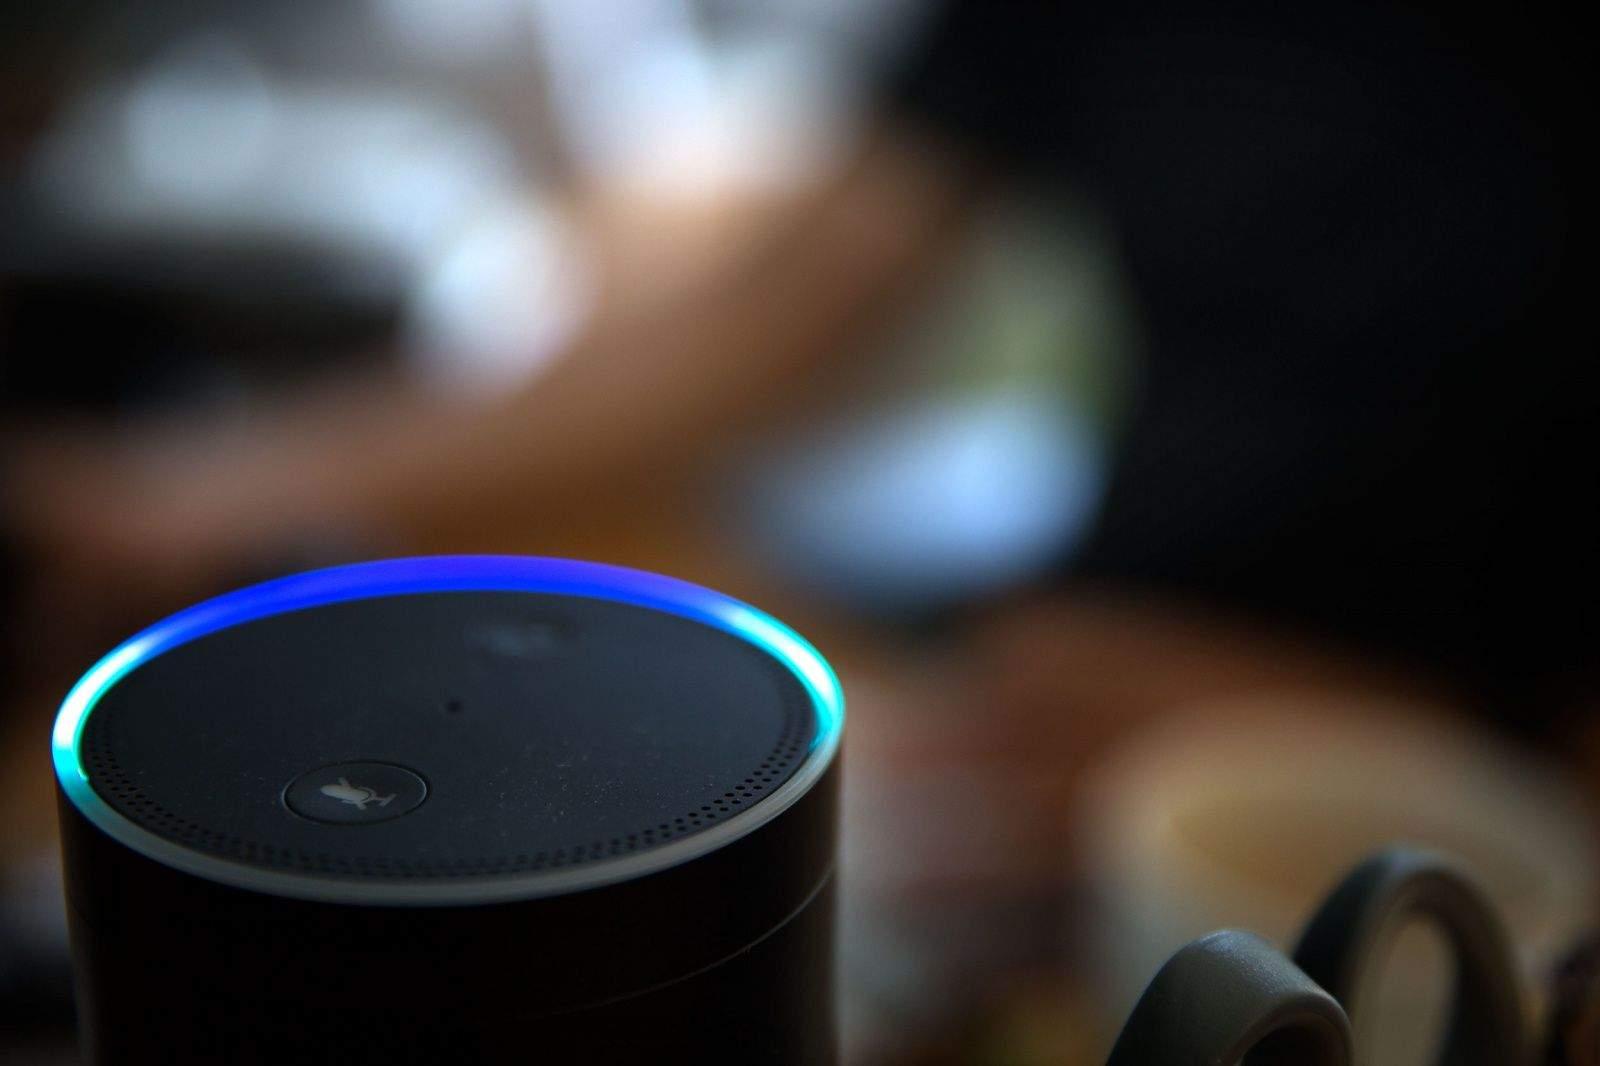 Siri y la alternativa al Echo